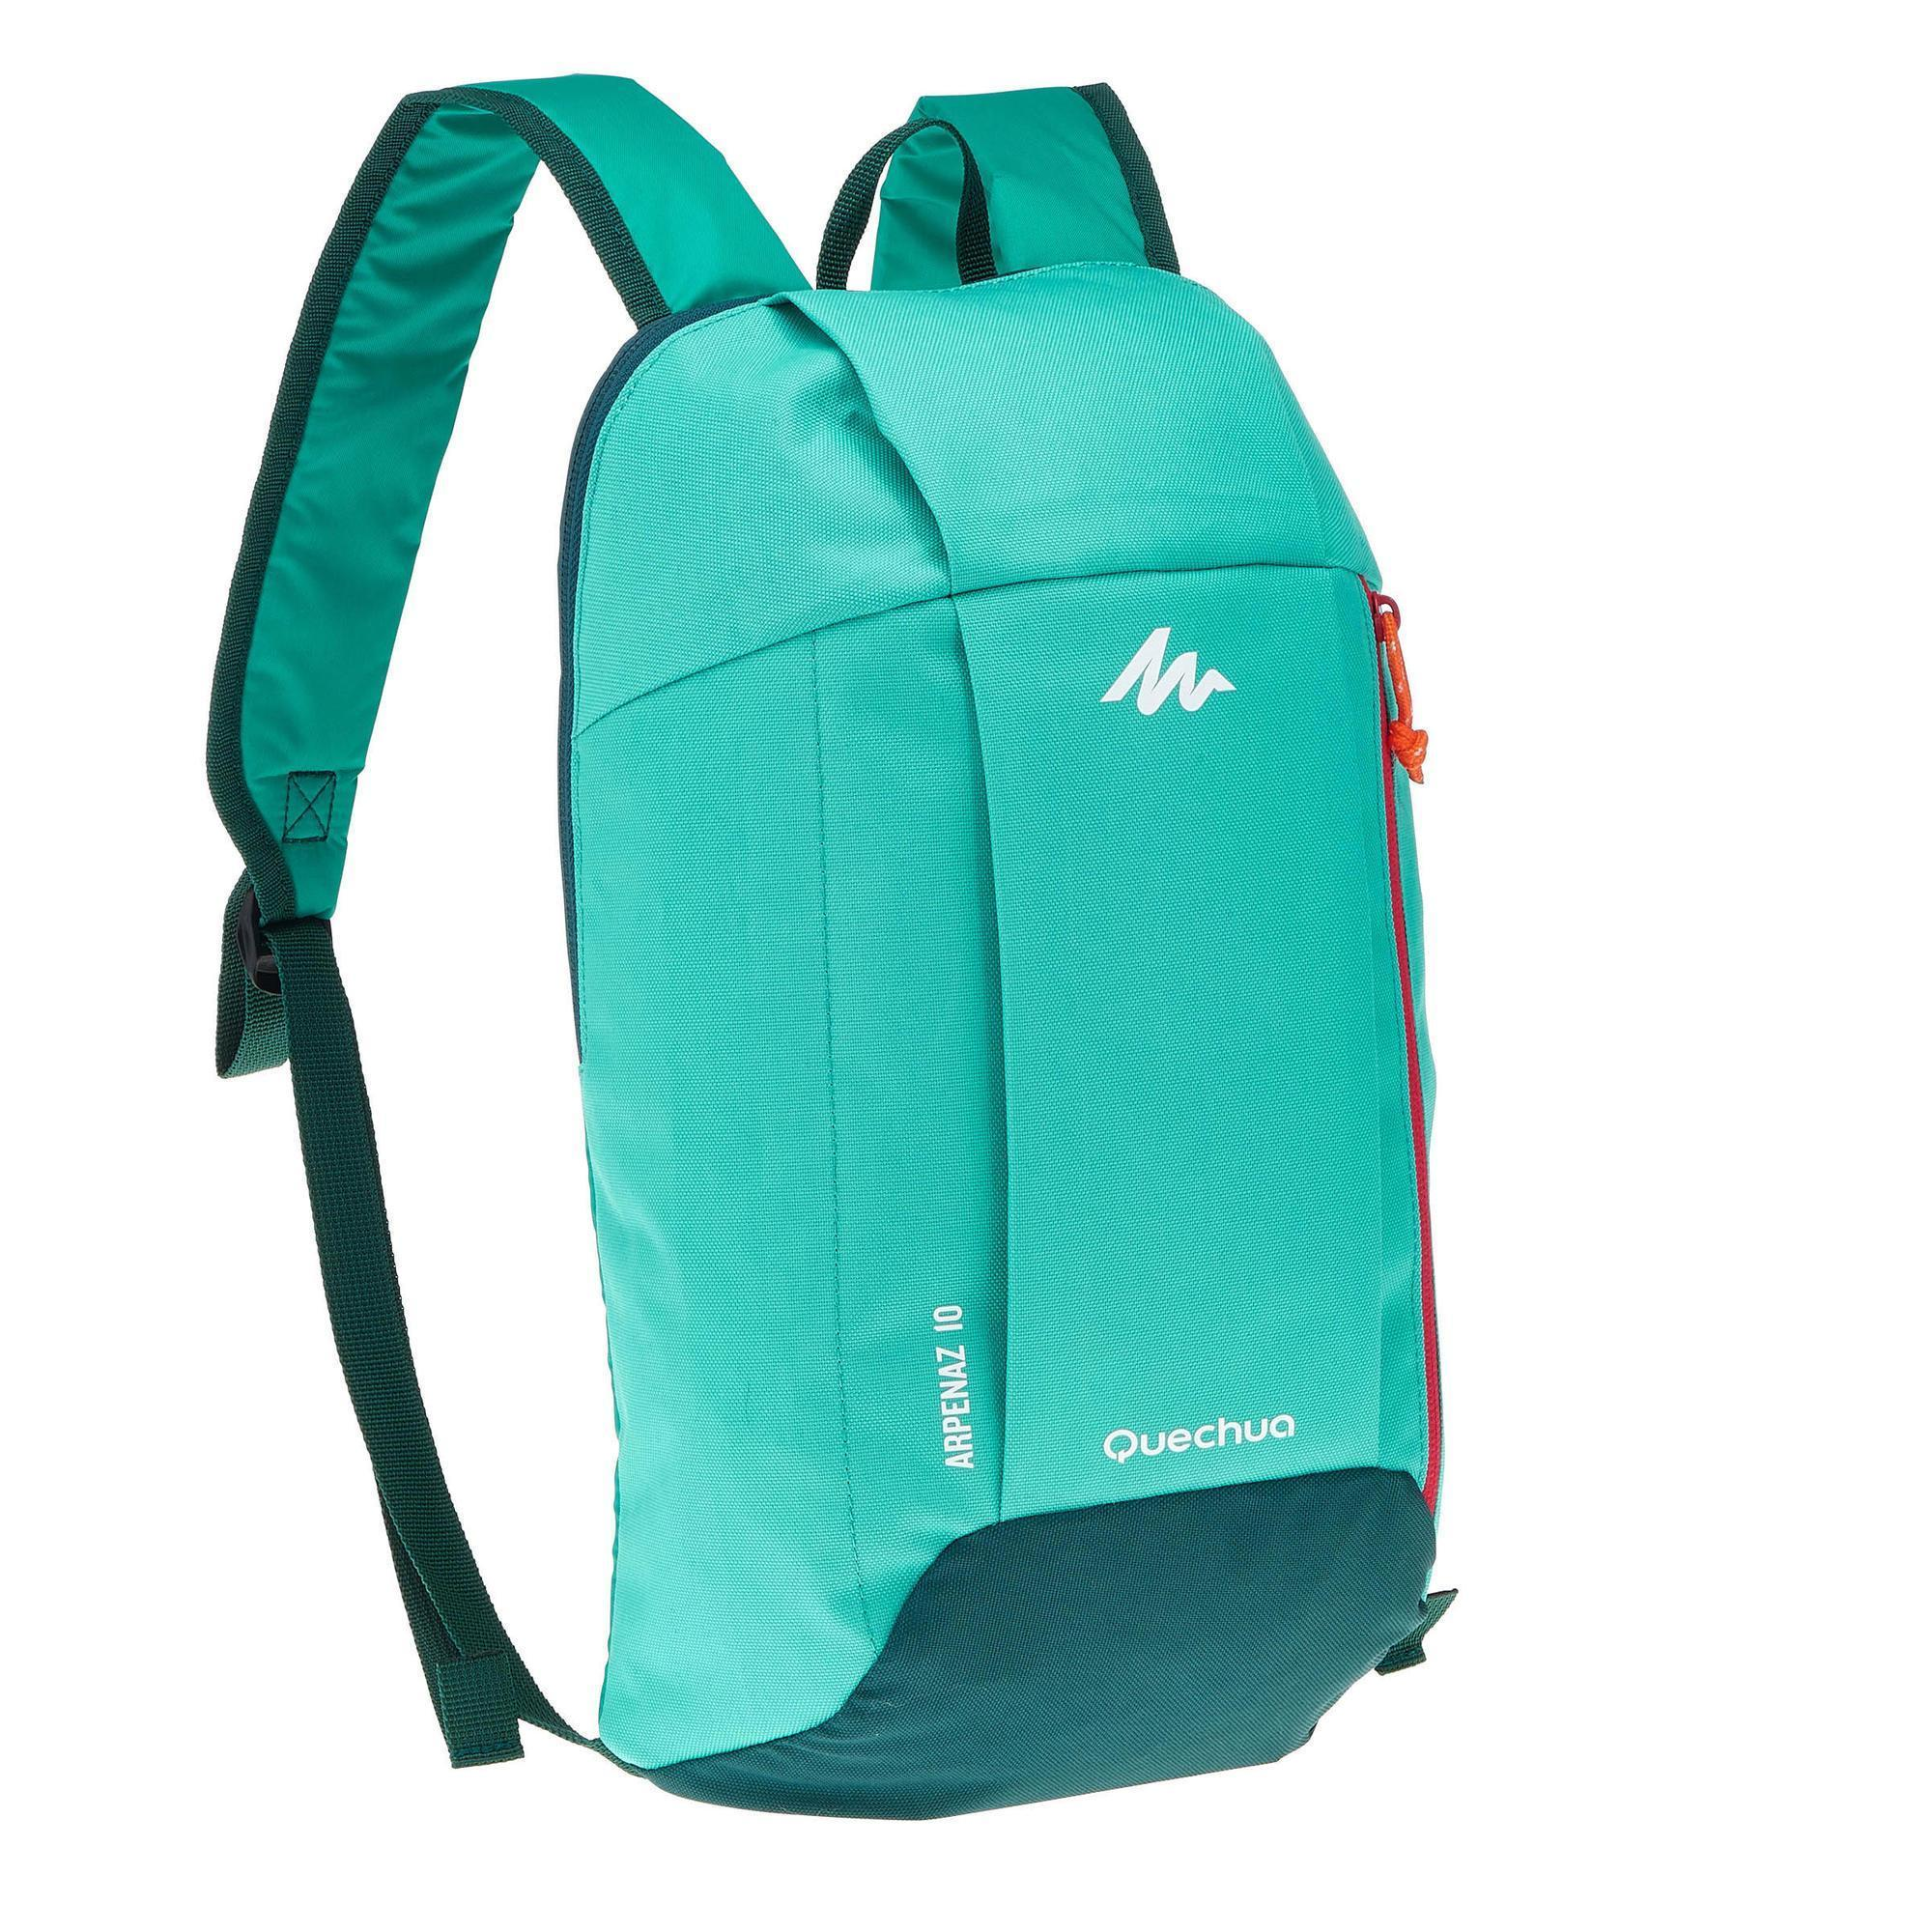 Nh100 10 L Hiking Backpack Mint Green Quechua